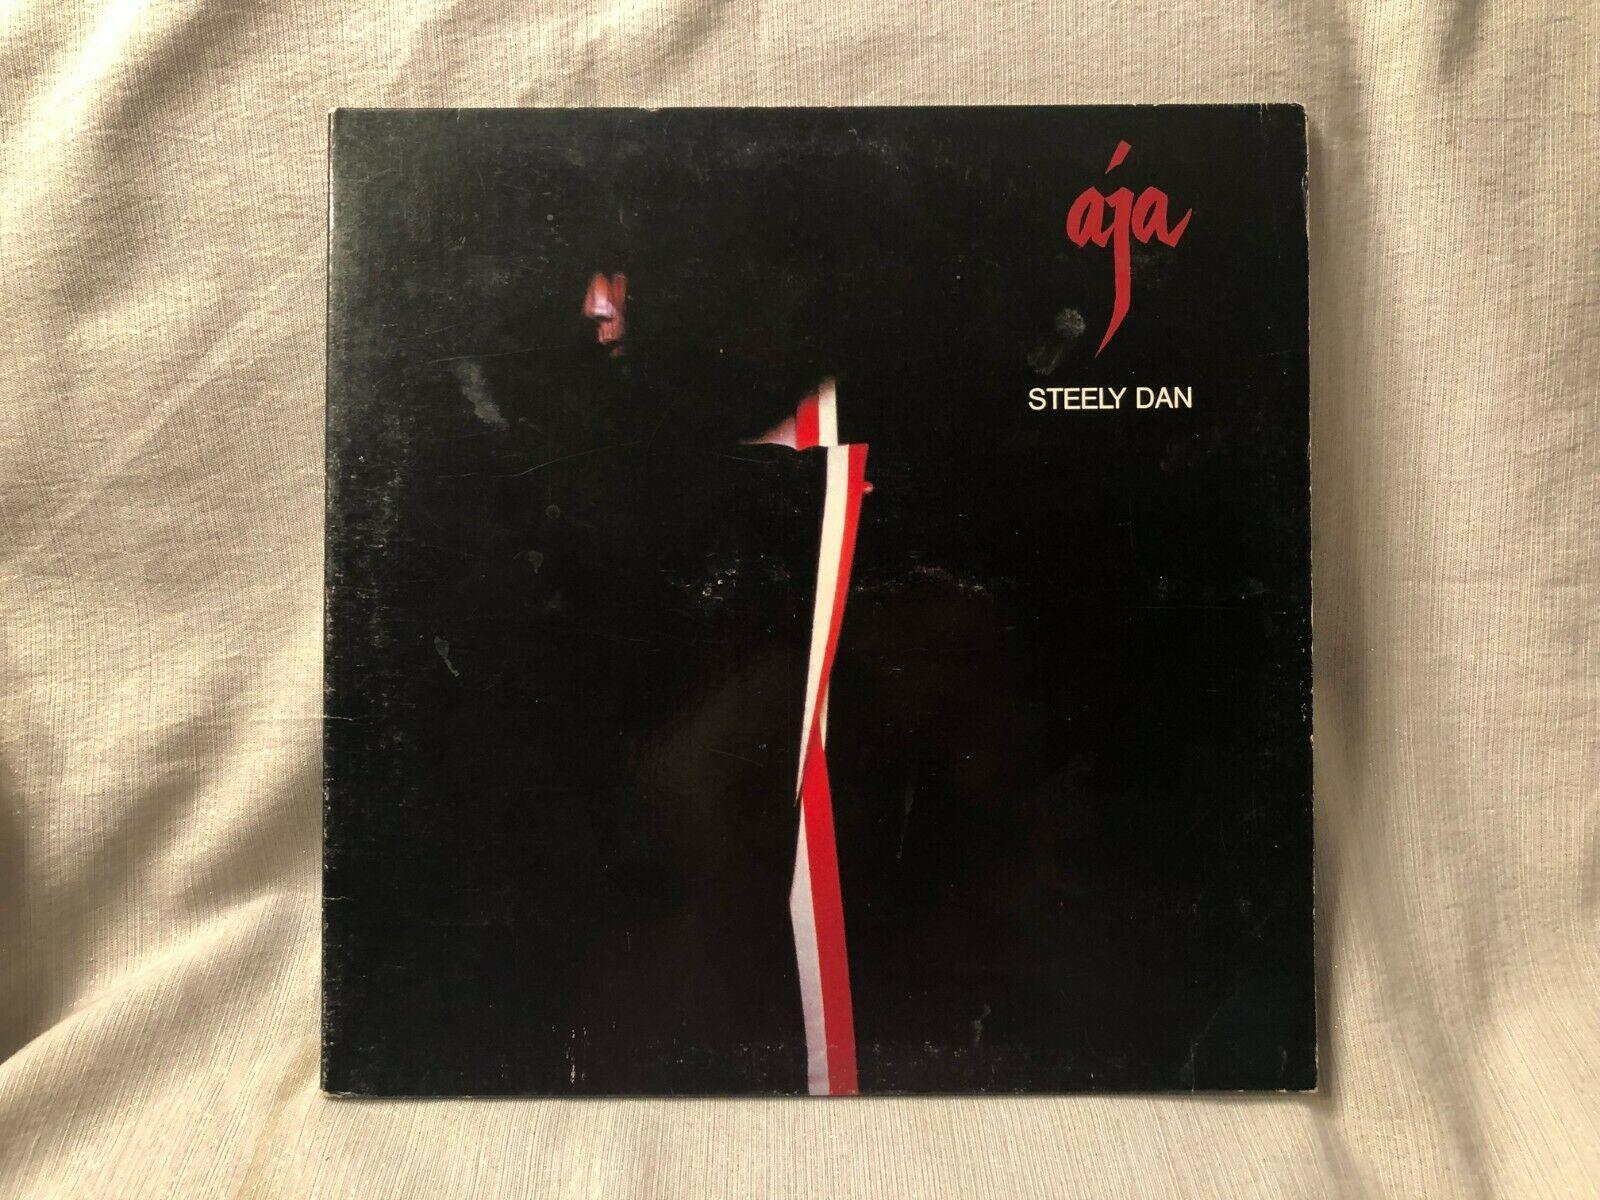 1977 Steely Dan Aja LP Record Vinyl Album ABC Records AB-1006 VG+/VG